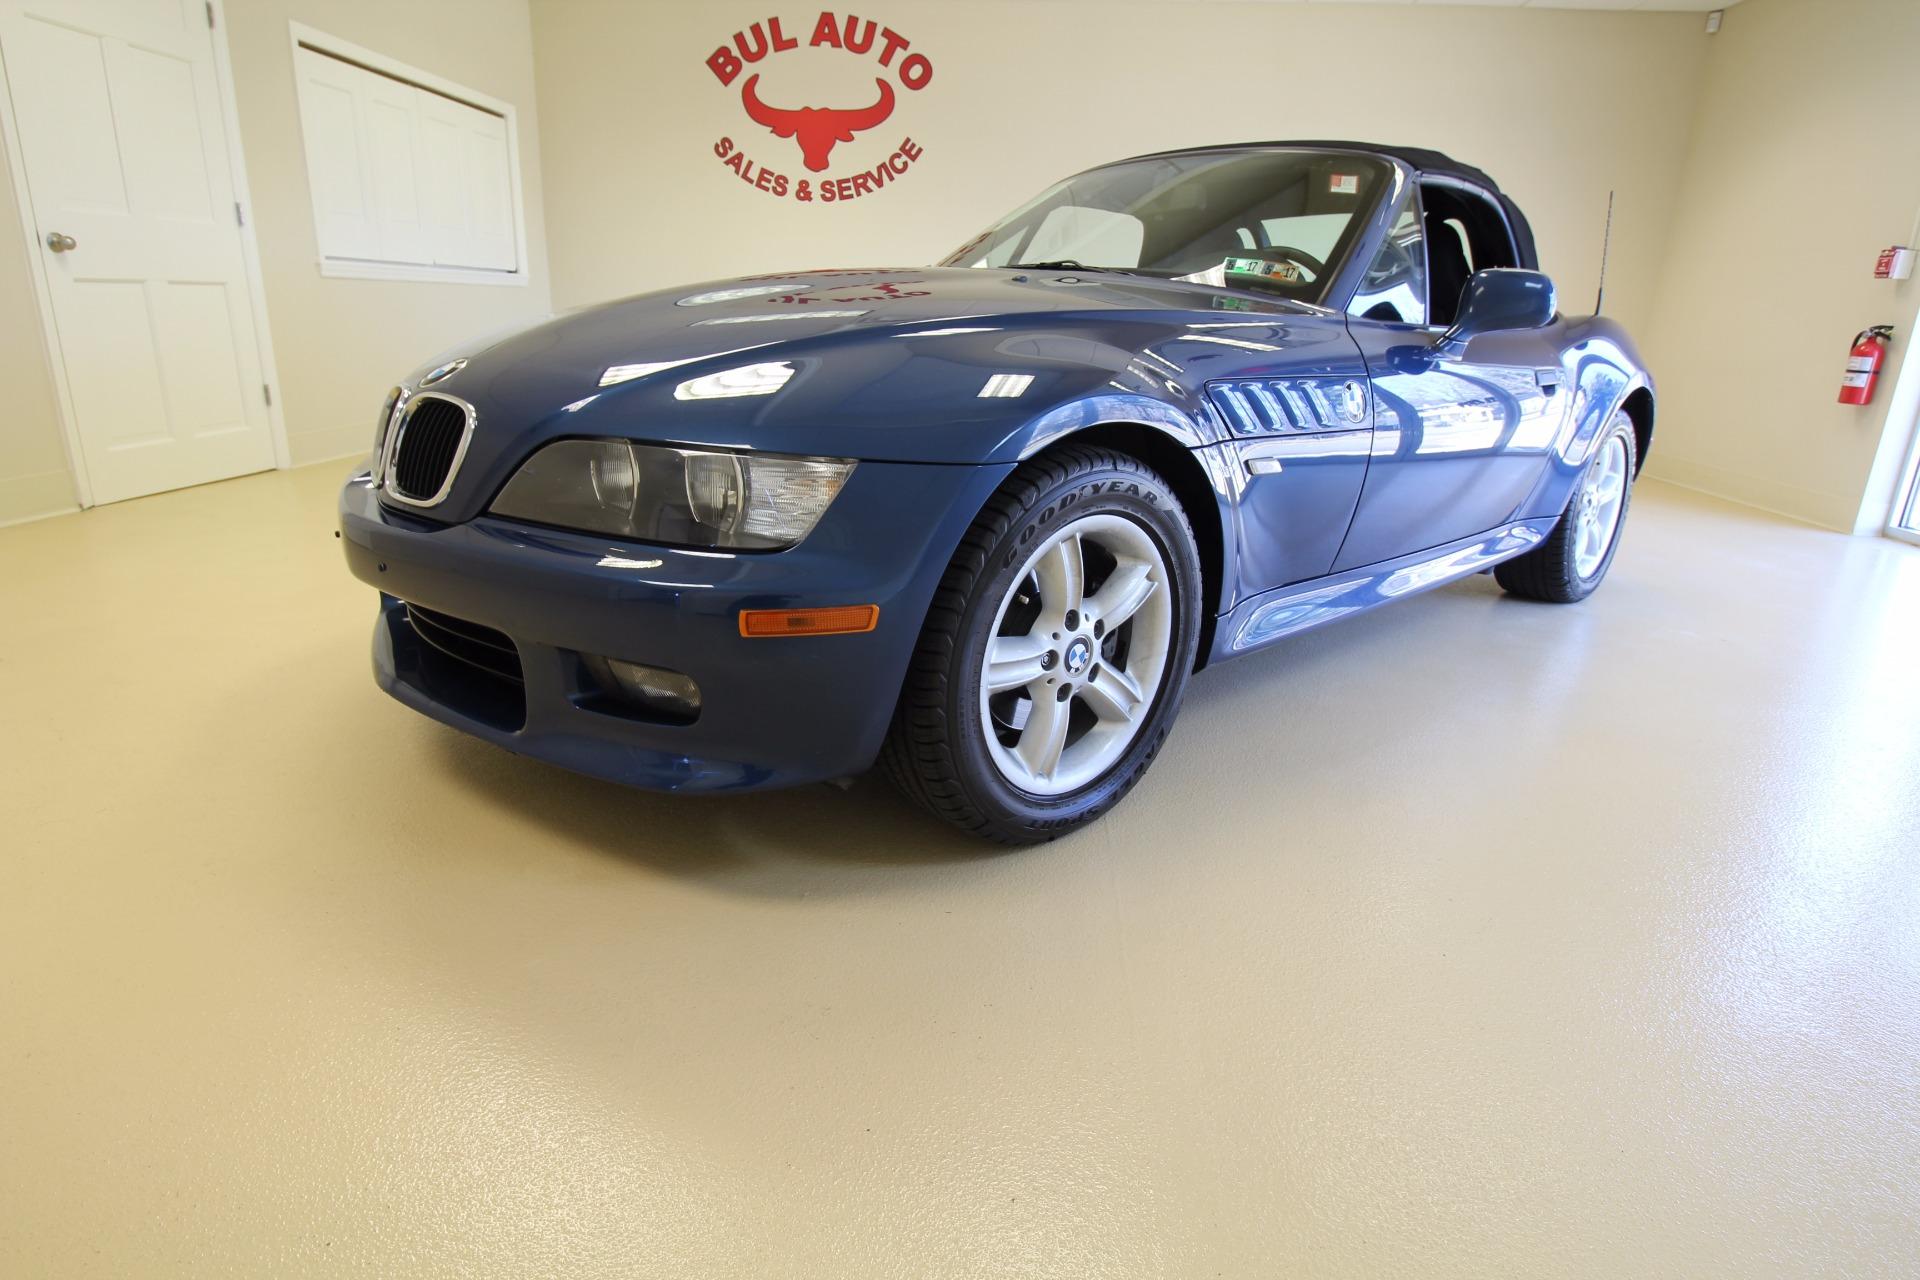 Used 2002 BMW Z3 Roadster 2.5i | Albany, NY